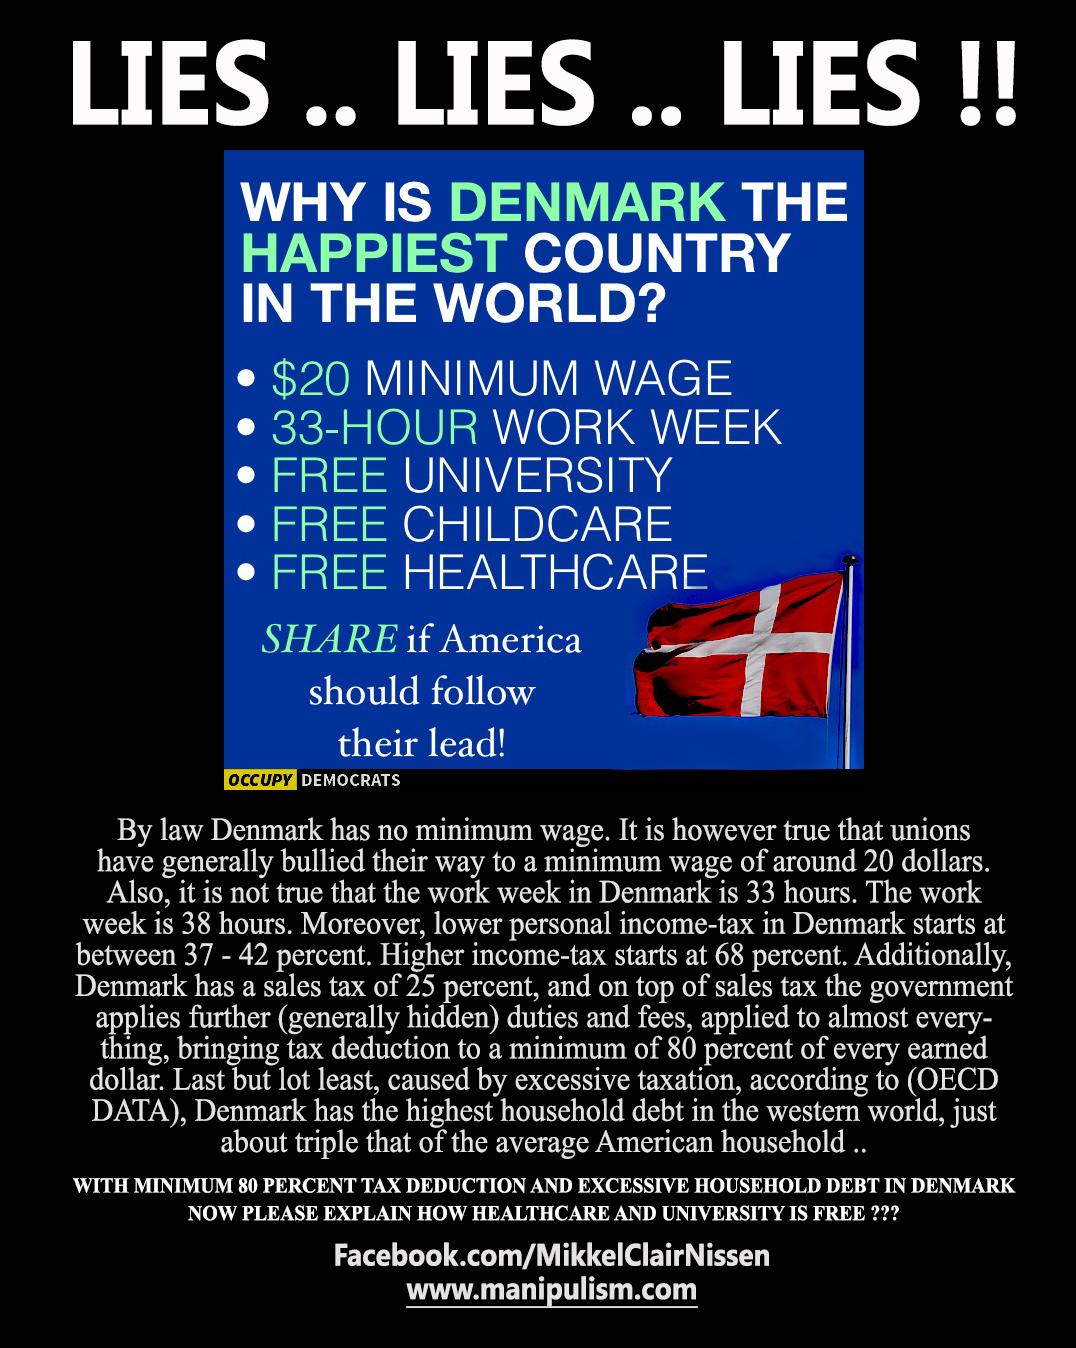 Democratic Socialism and Denmark